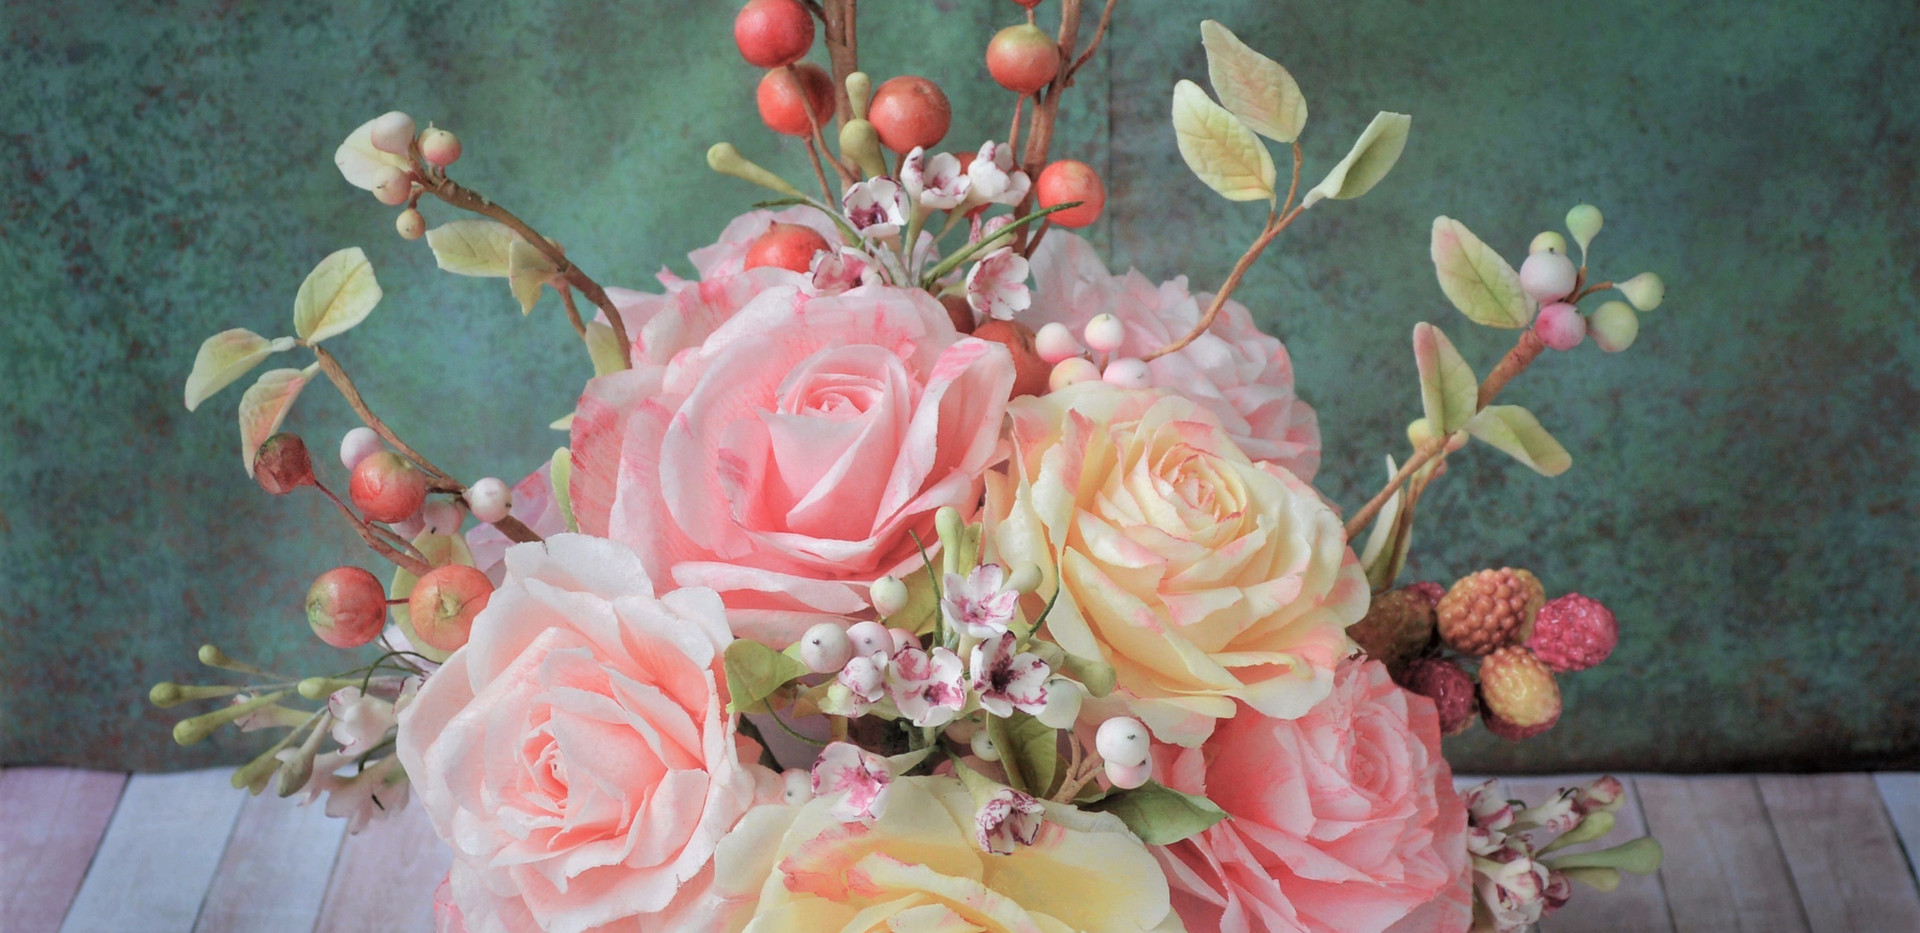 Wafer Paper Rose Boquet